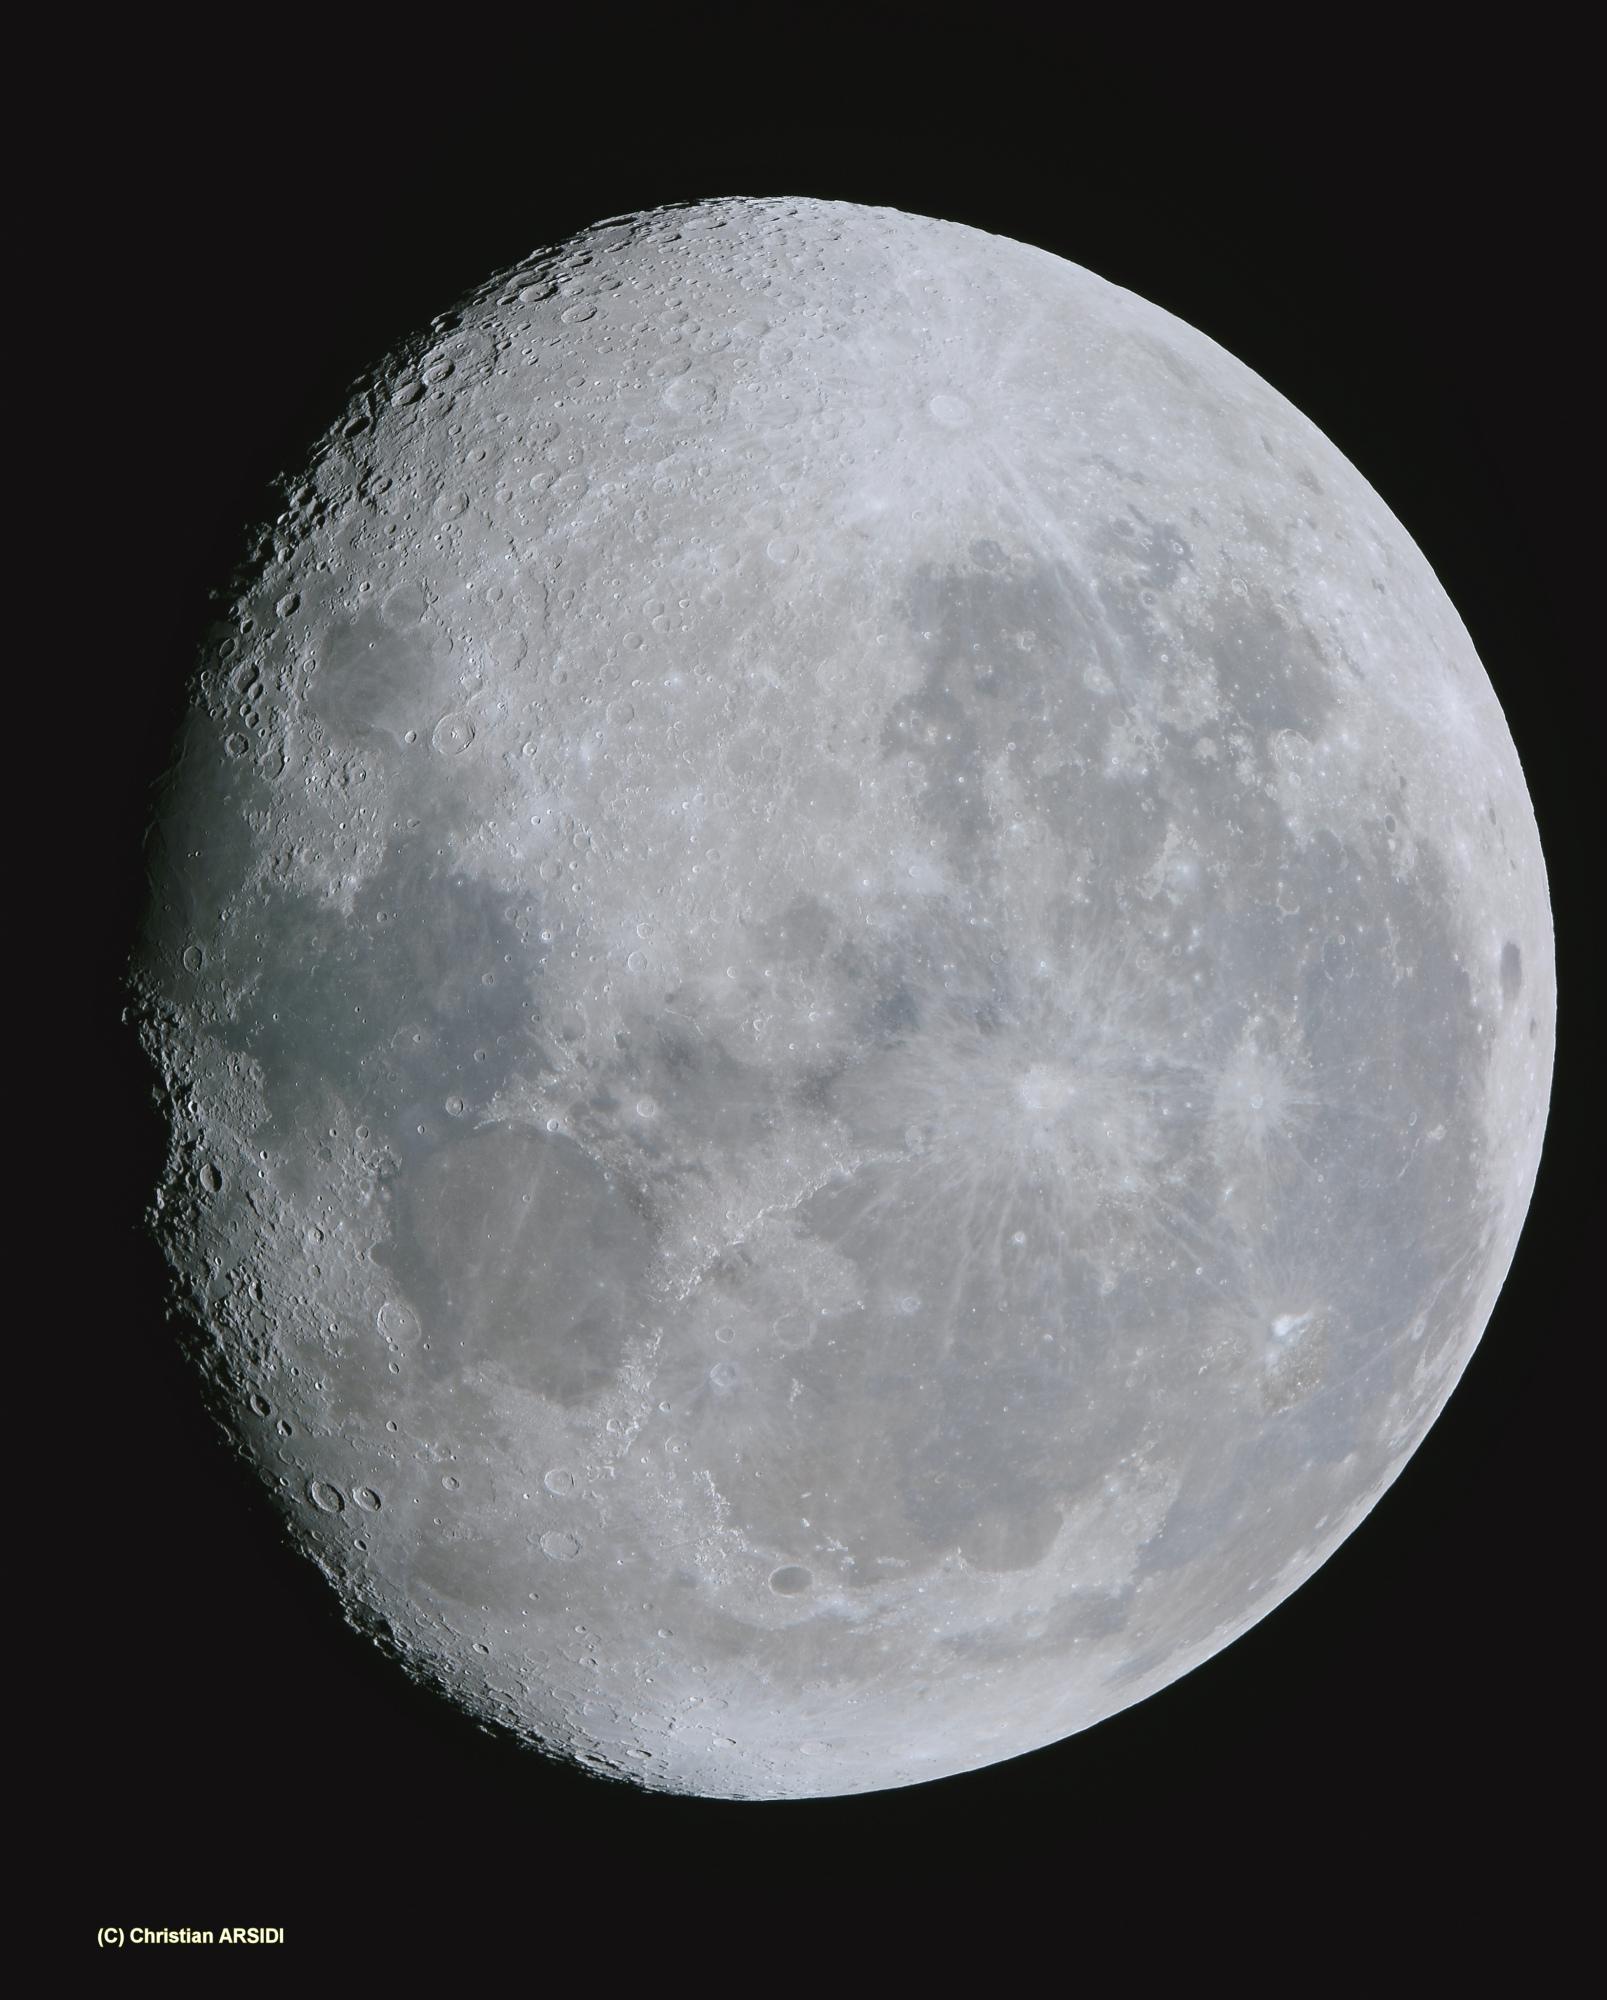 La Lune 9 images V2_DxO Recadrée.jpg